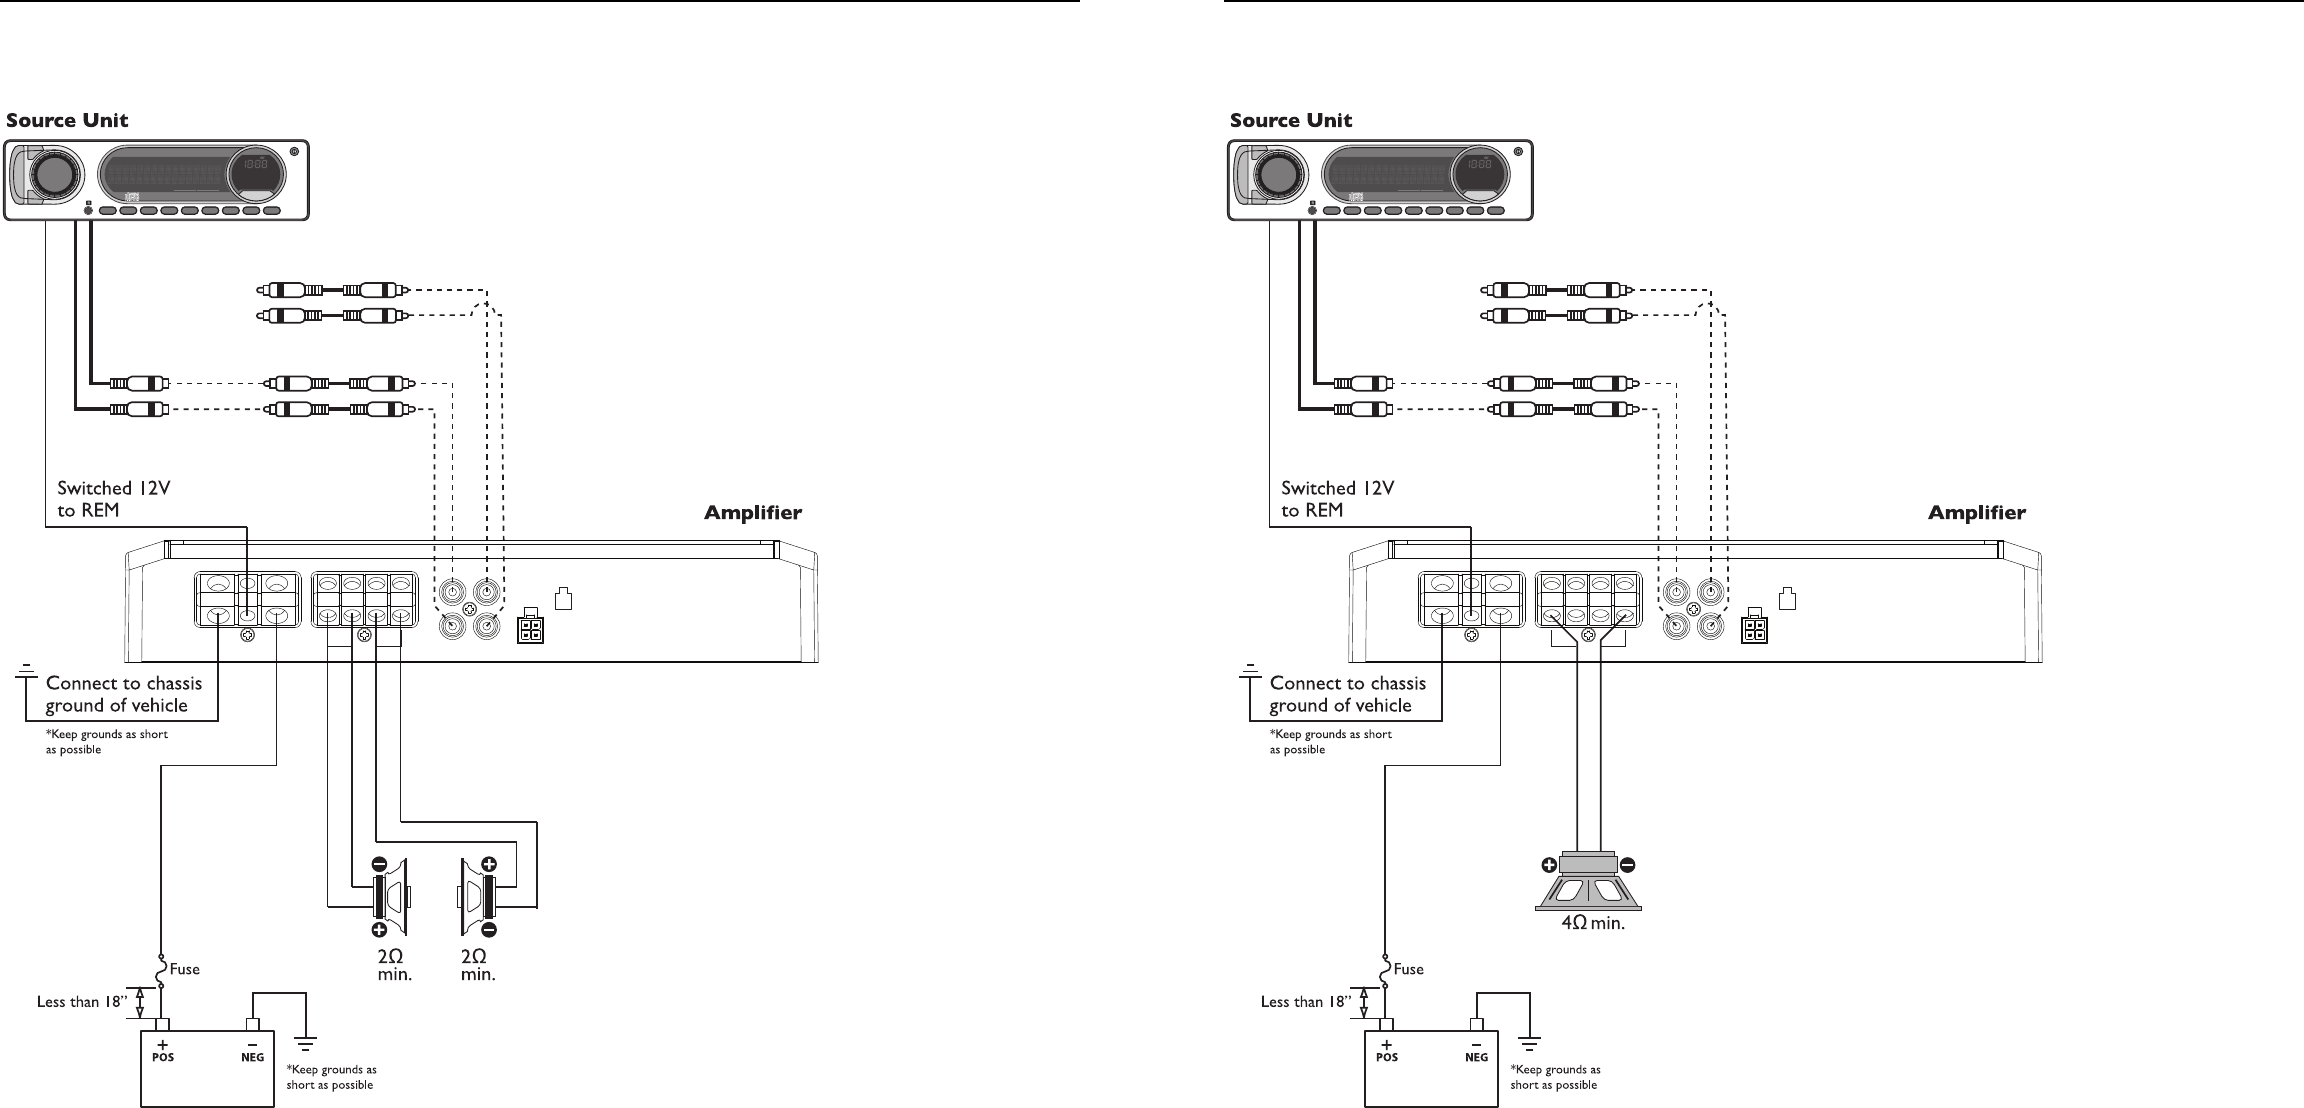 manual rockford fosgate r400-4d (page 5 of 15) (english)  libble.eu